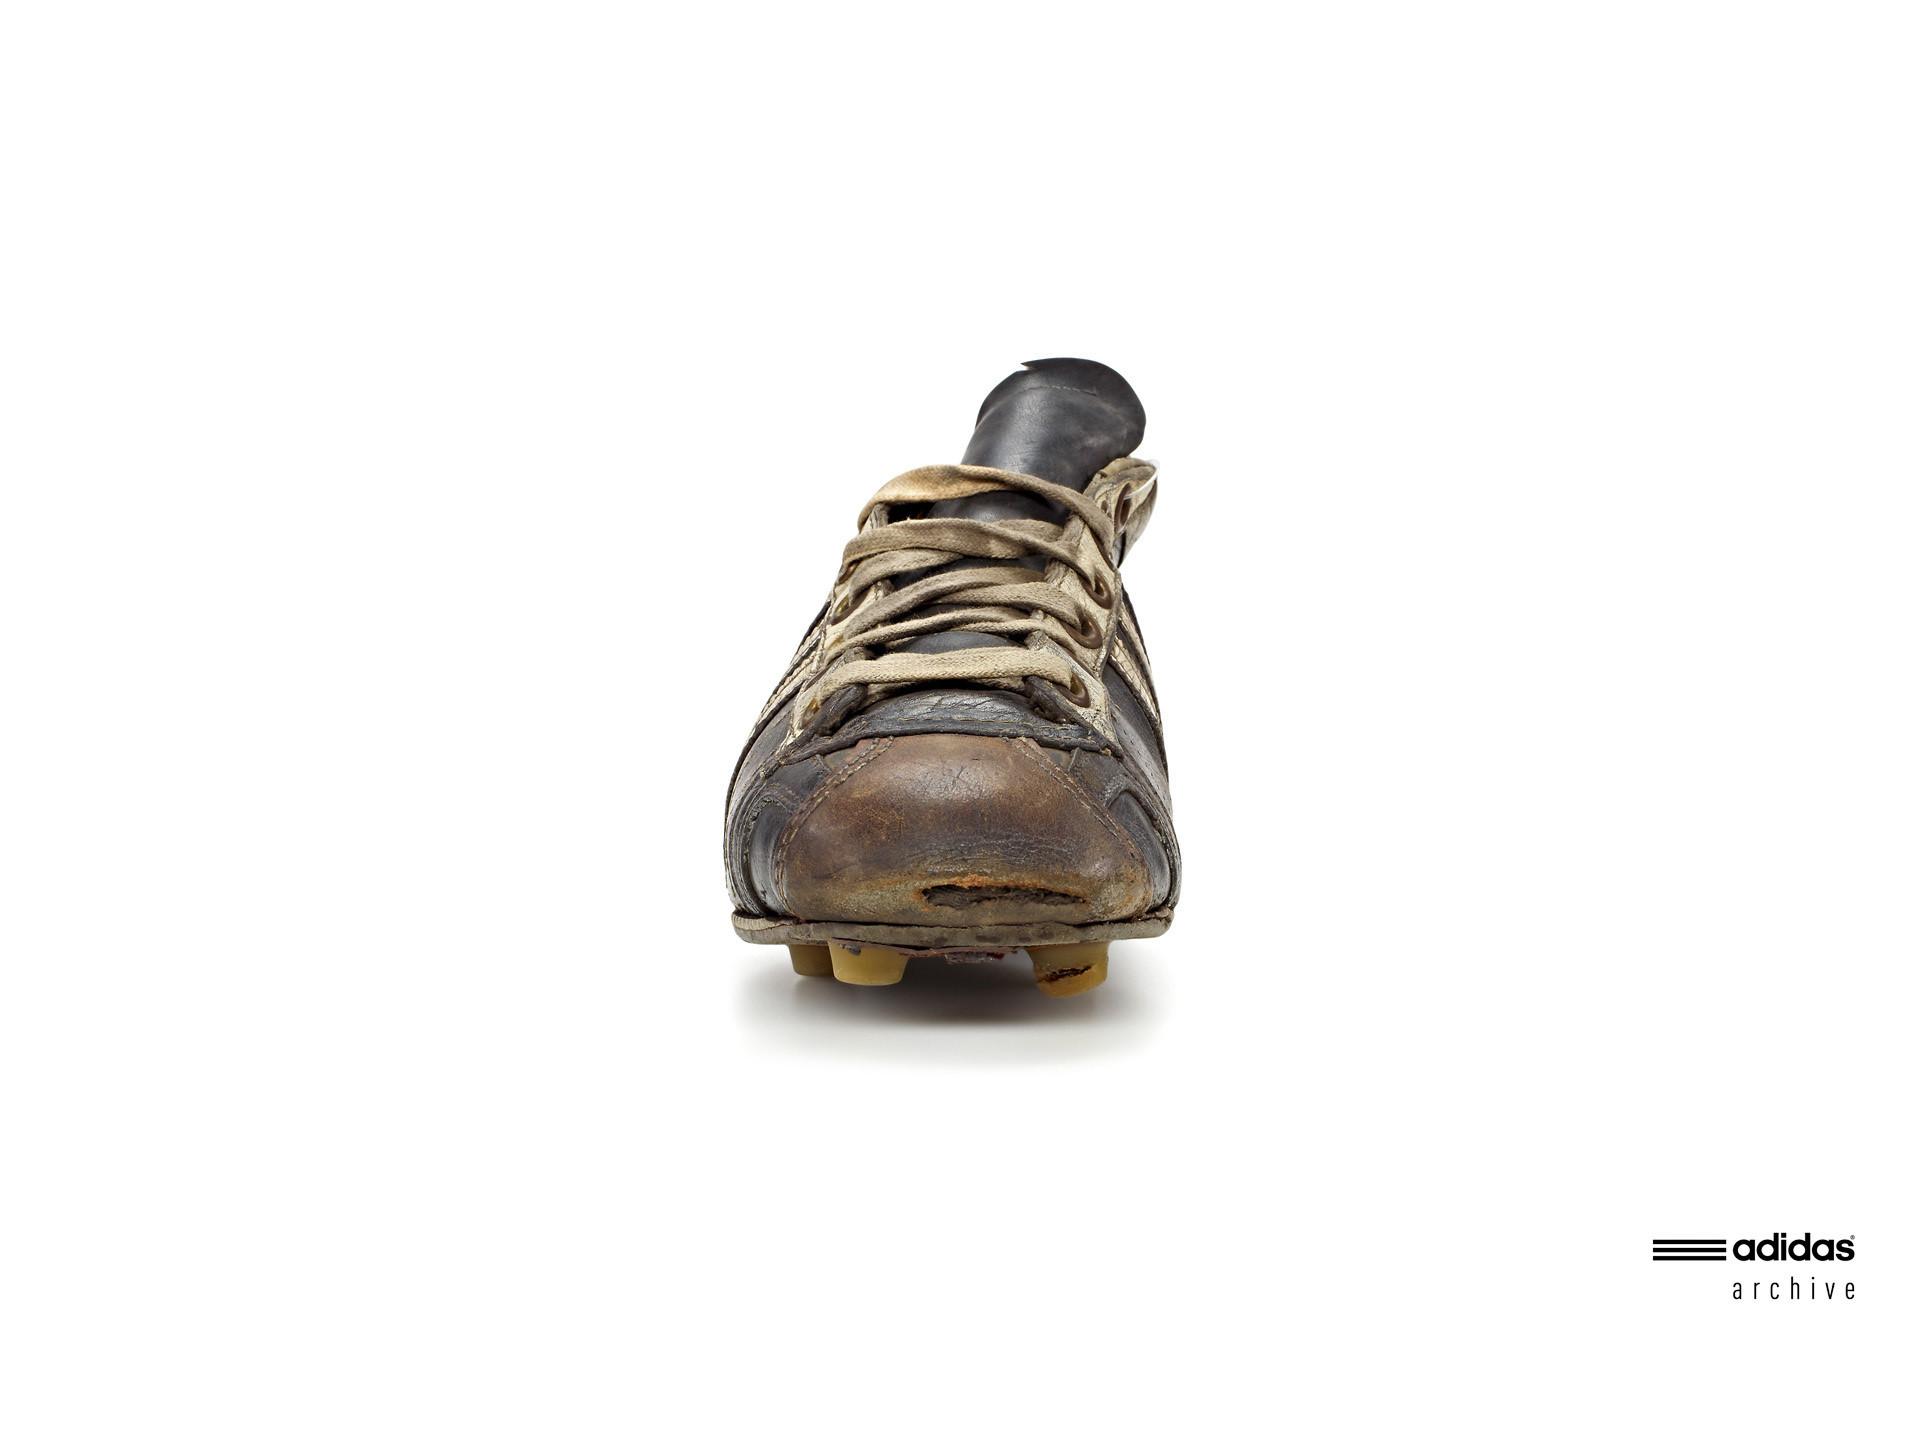 c14018120ac3 Adidas Sunlina Womens Black Ballet Flat Shoes Kako Oslikati Adidas ...